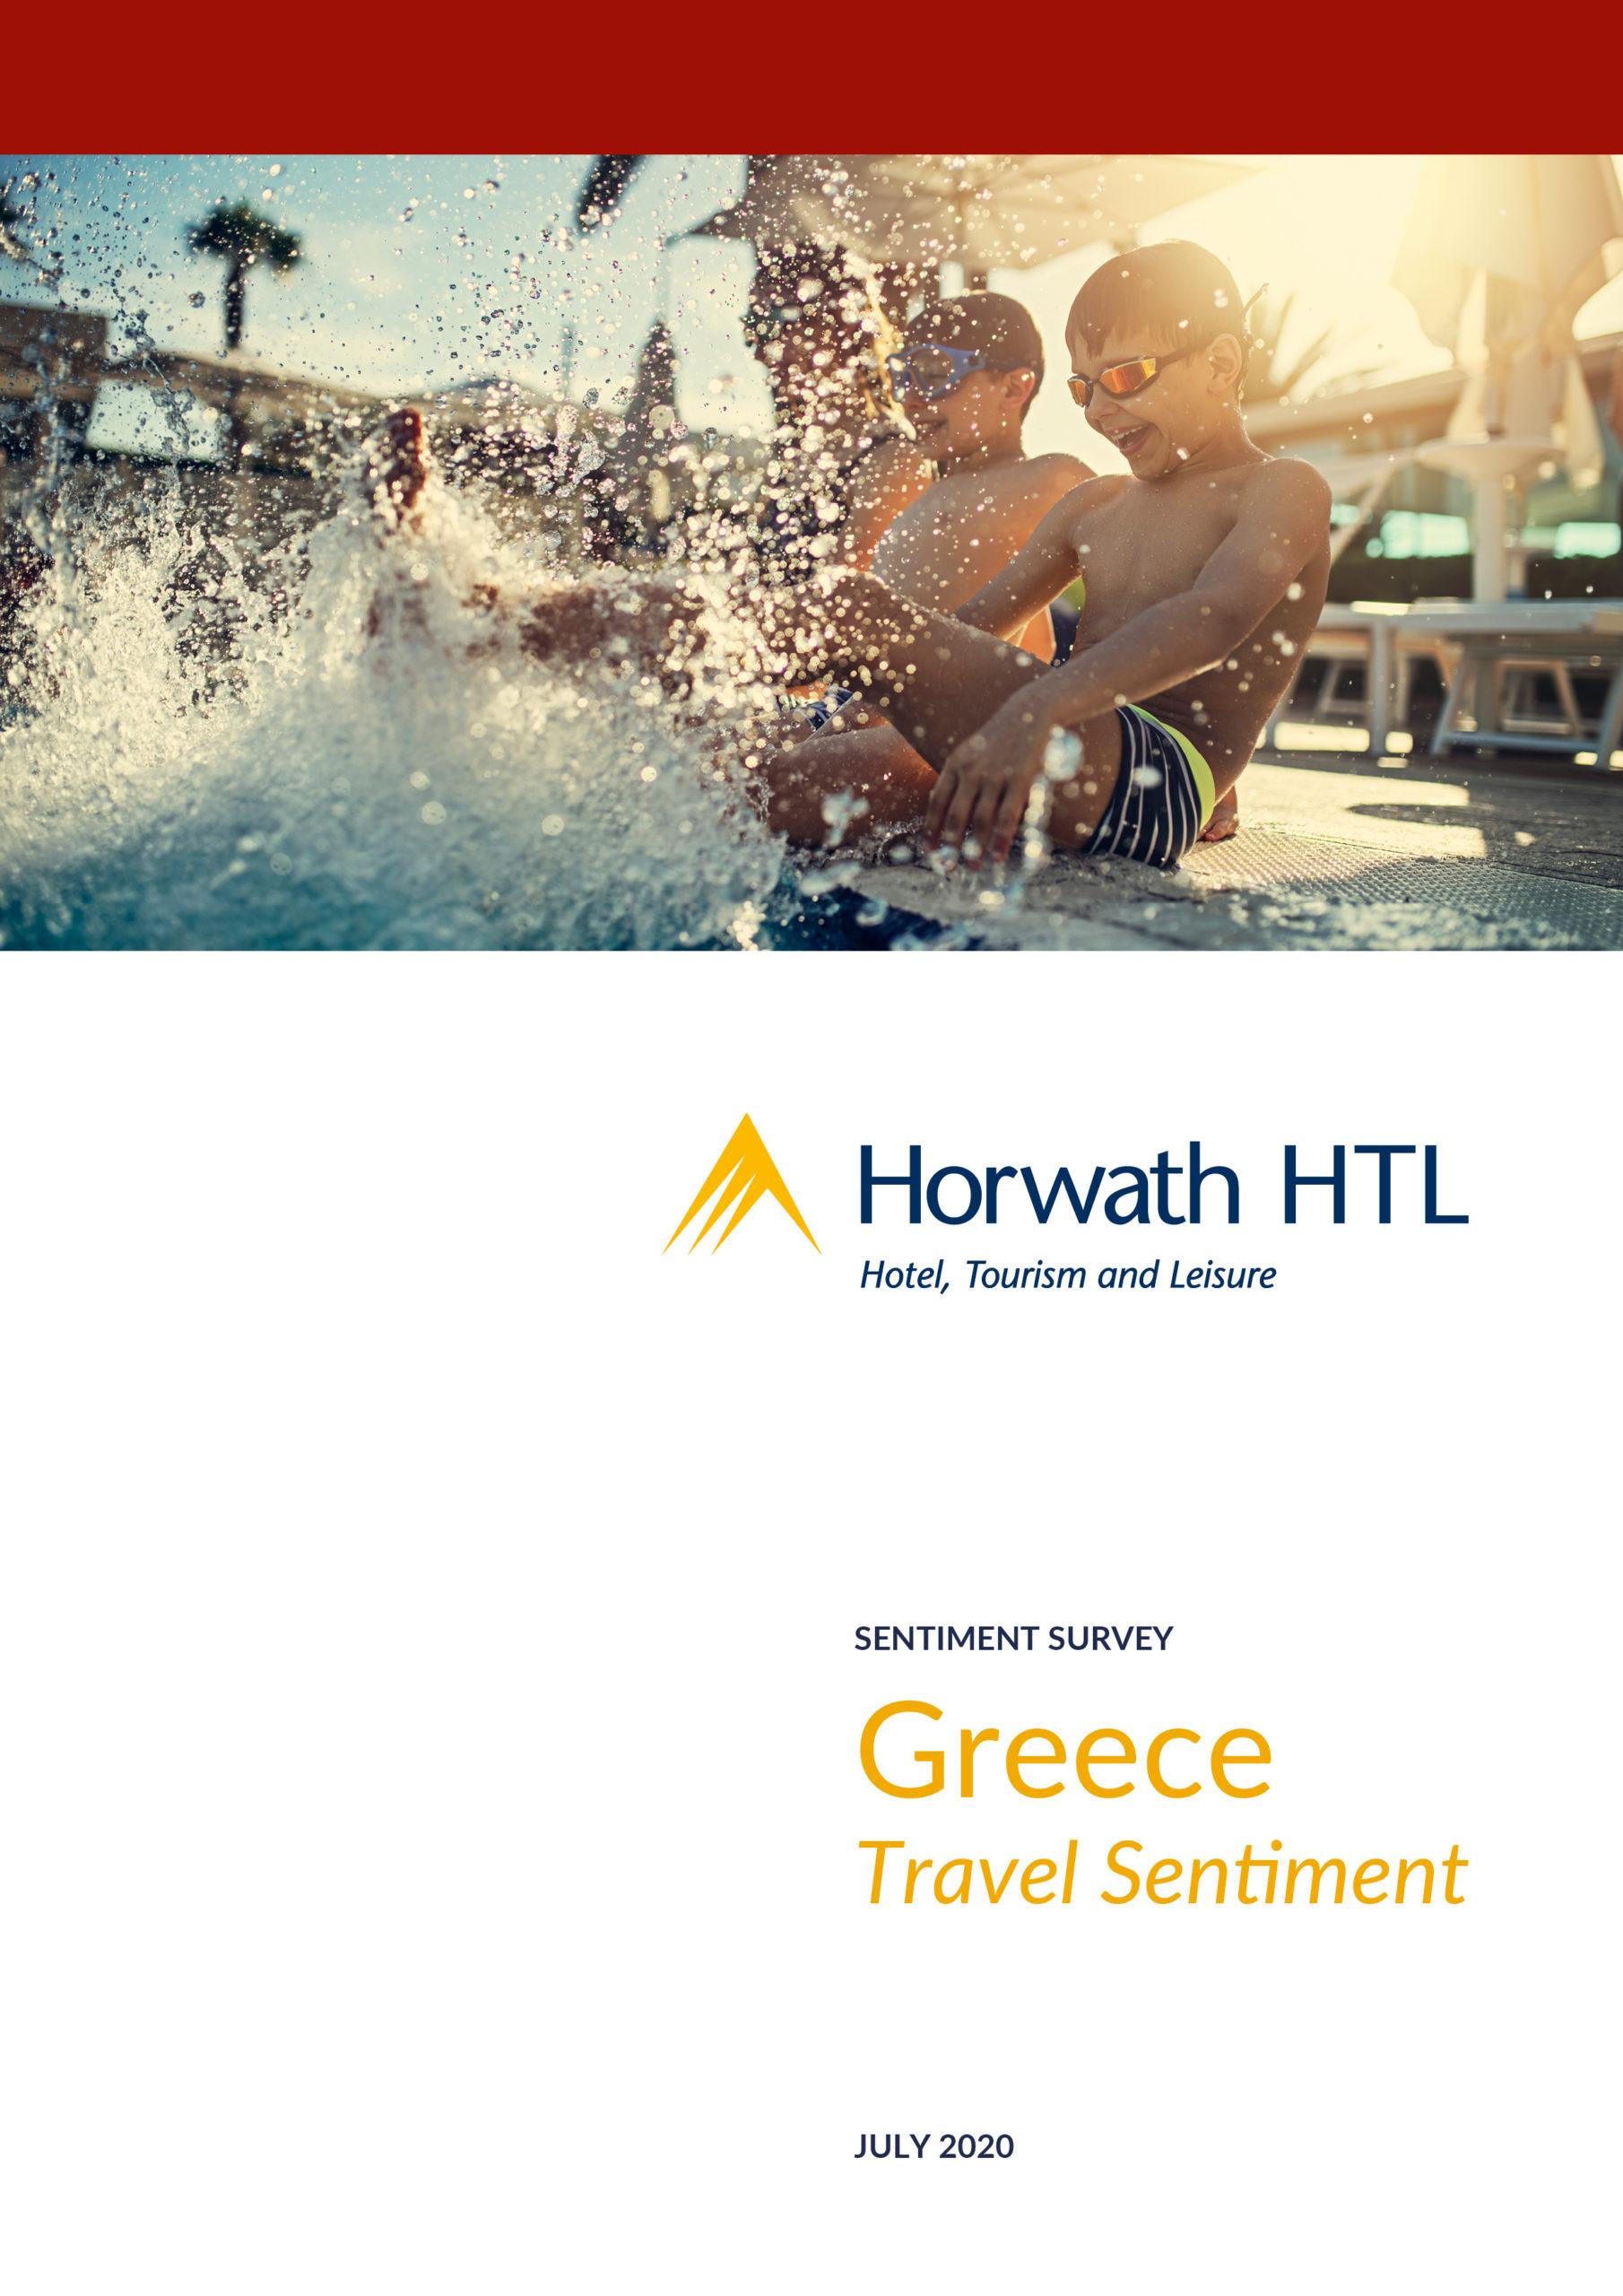 Greece Travel Sentiment Survey